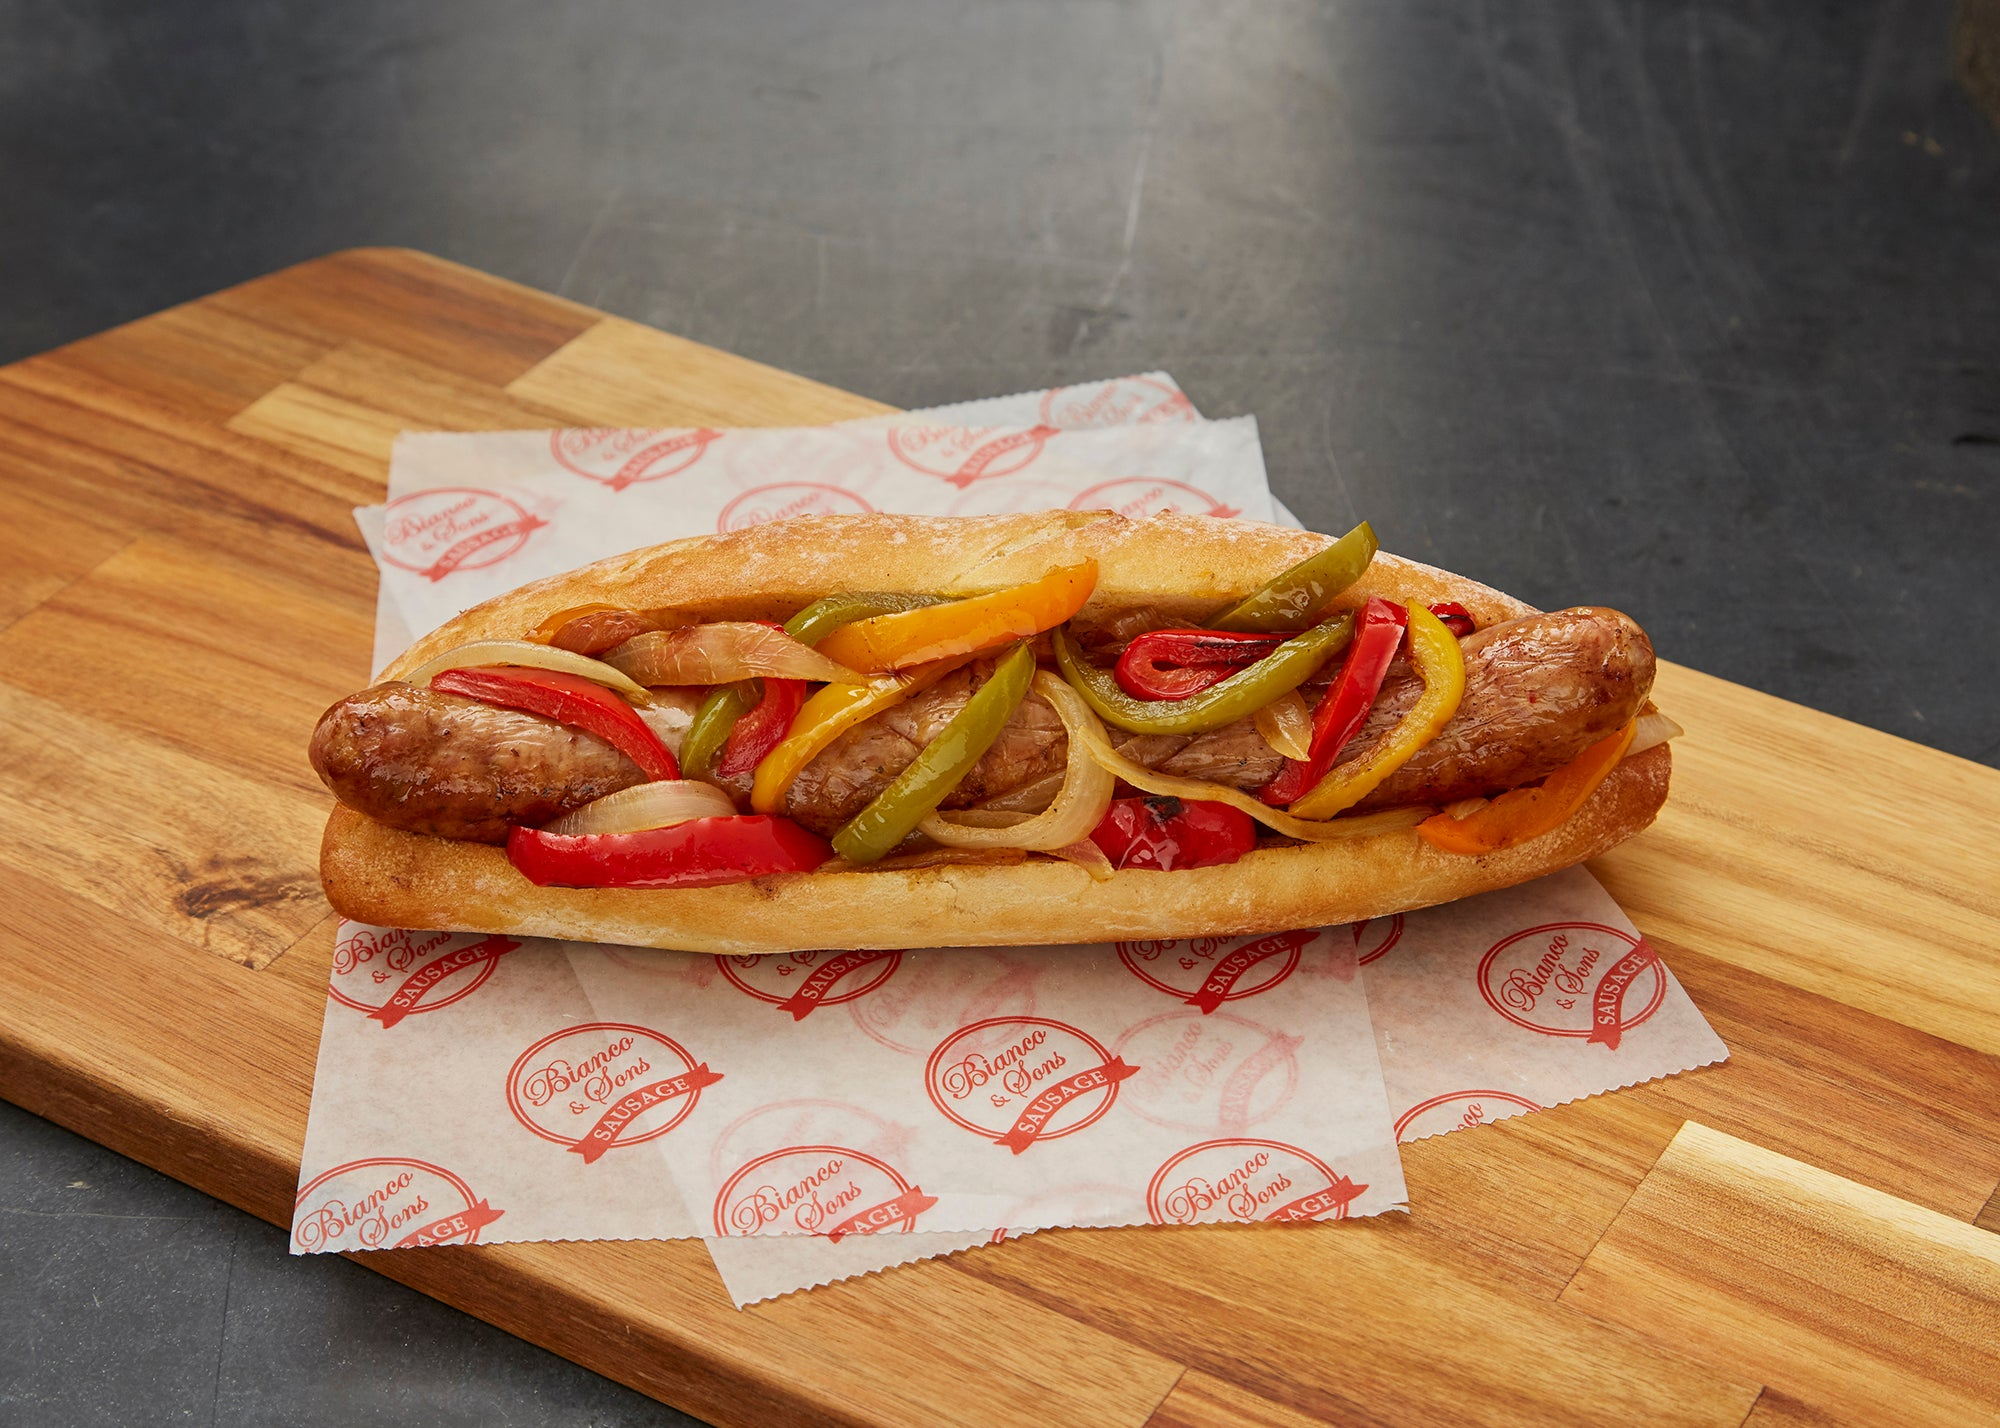 Bianco & Sons Sausage